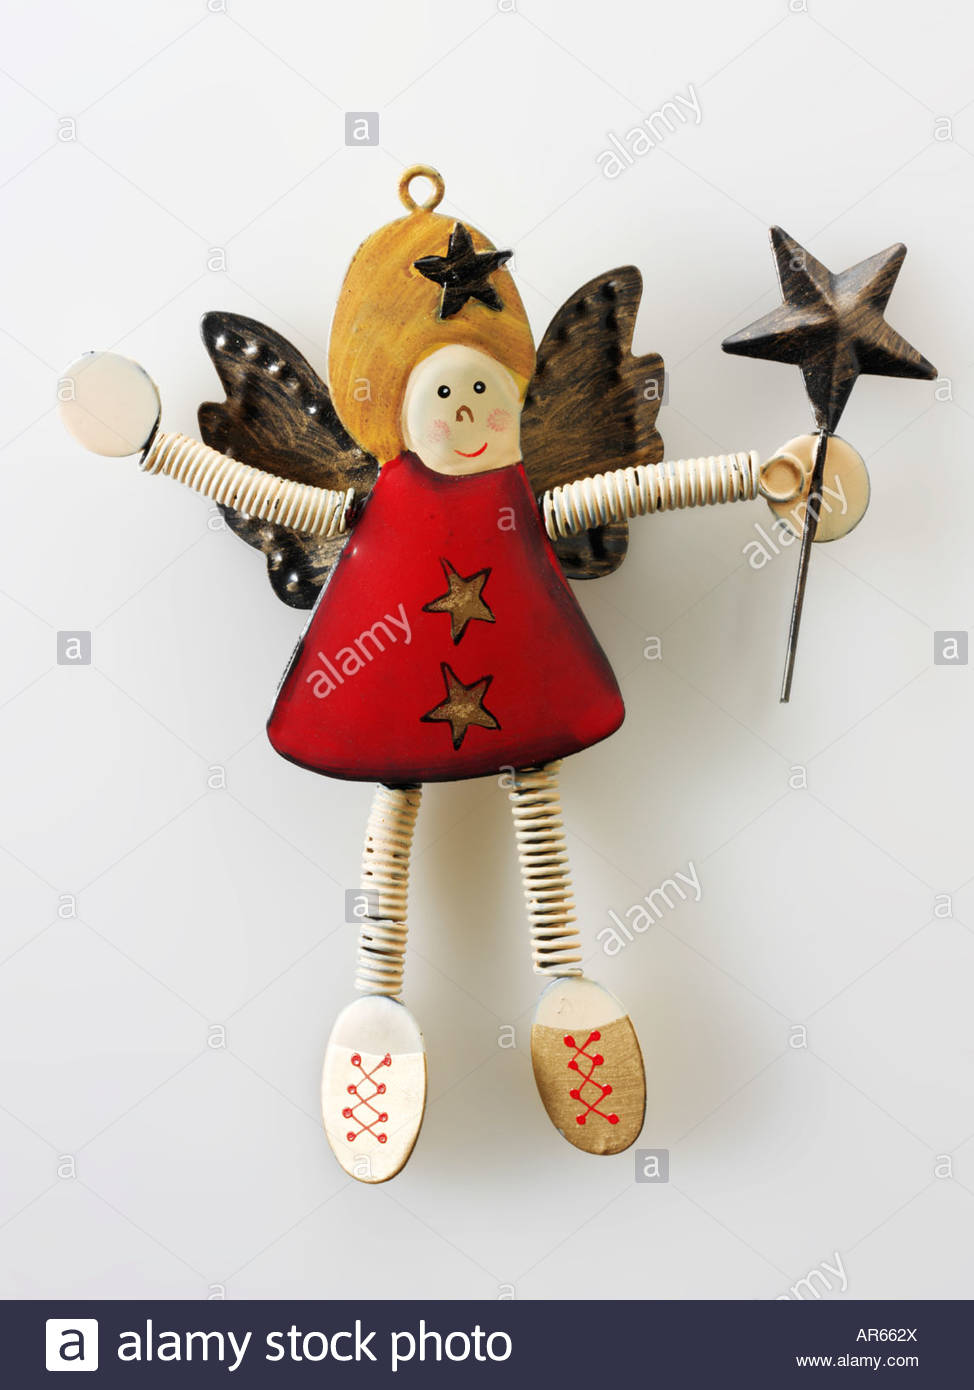 festive  wooden  'christmas angel' - Stock Image